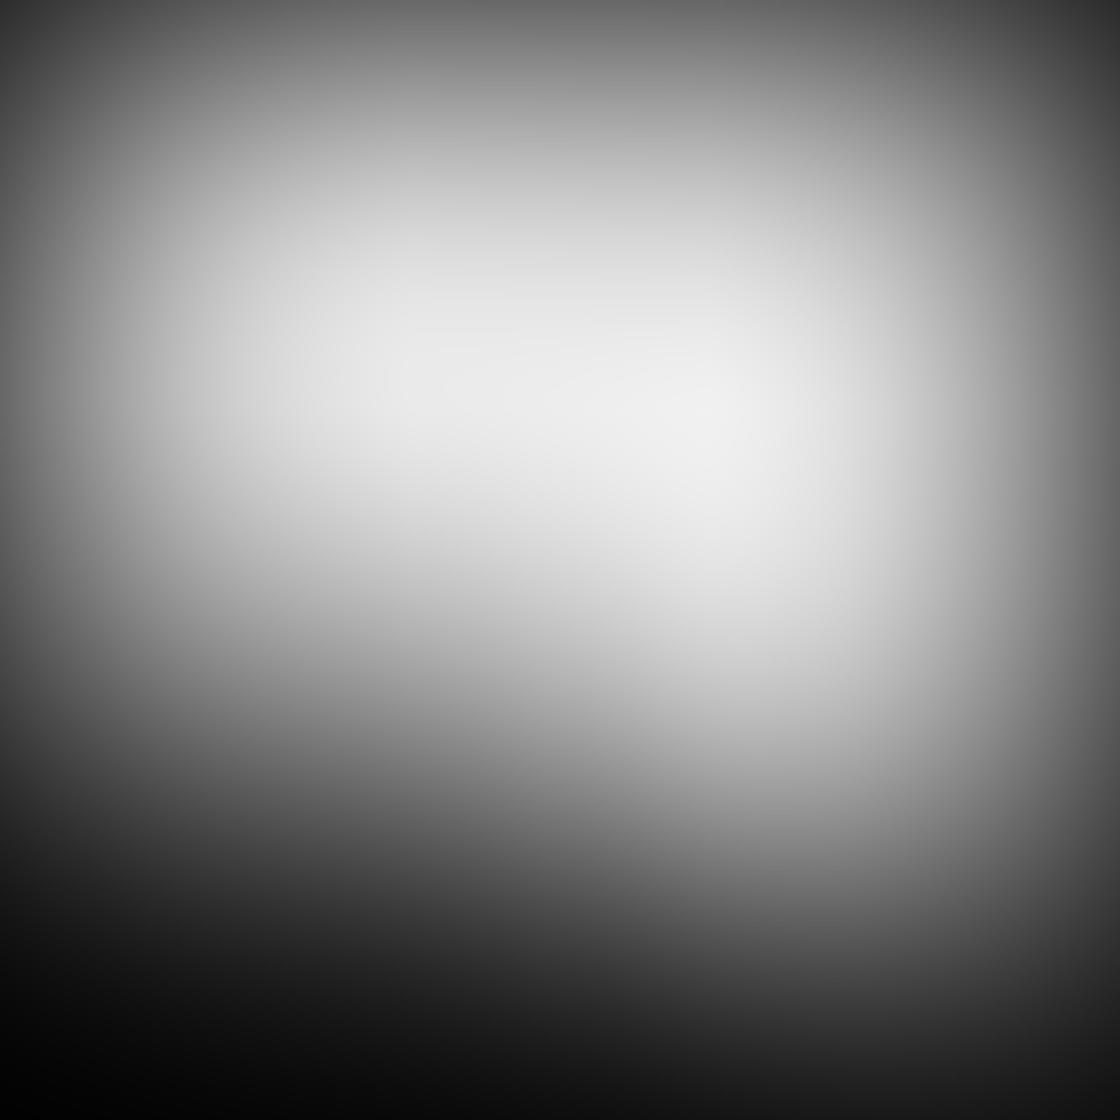 iPhone Silhouette Photos 21